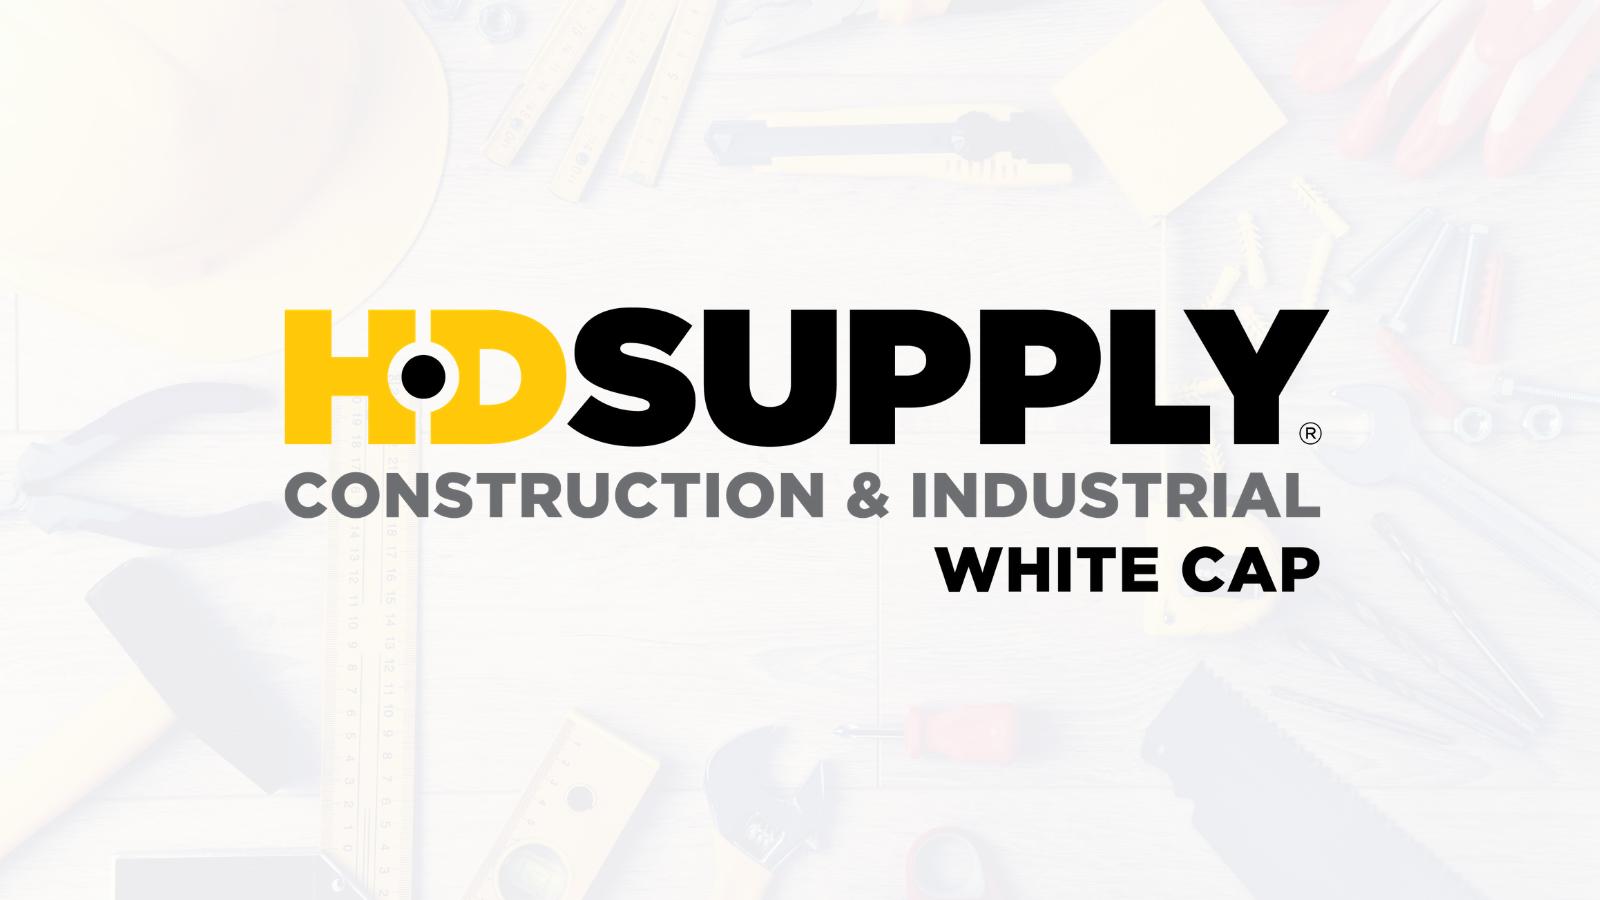 HD Supply White Cap Case Study: Optimizing the Marketing Funnel